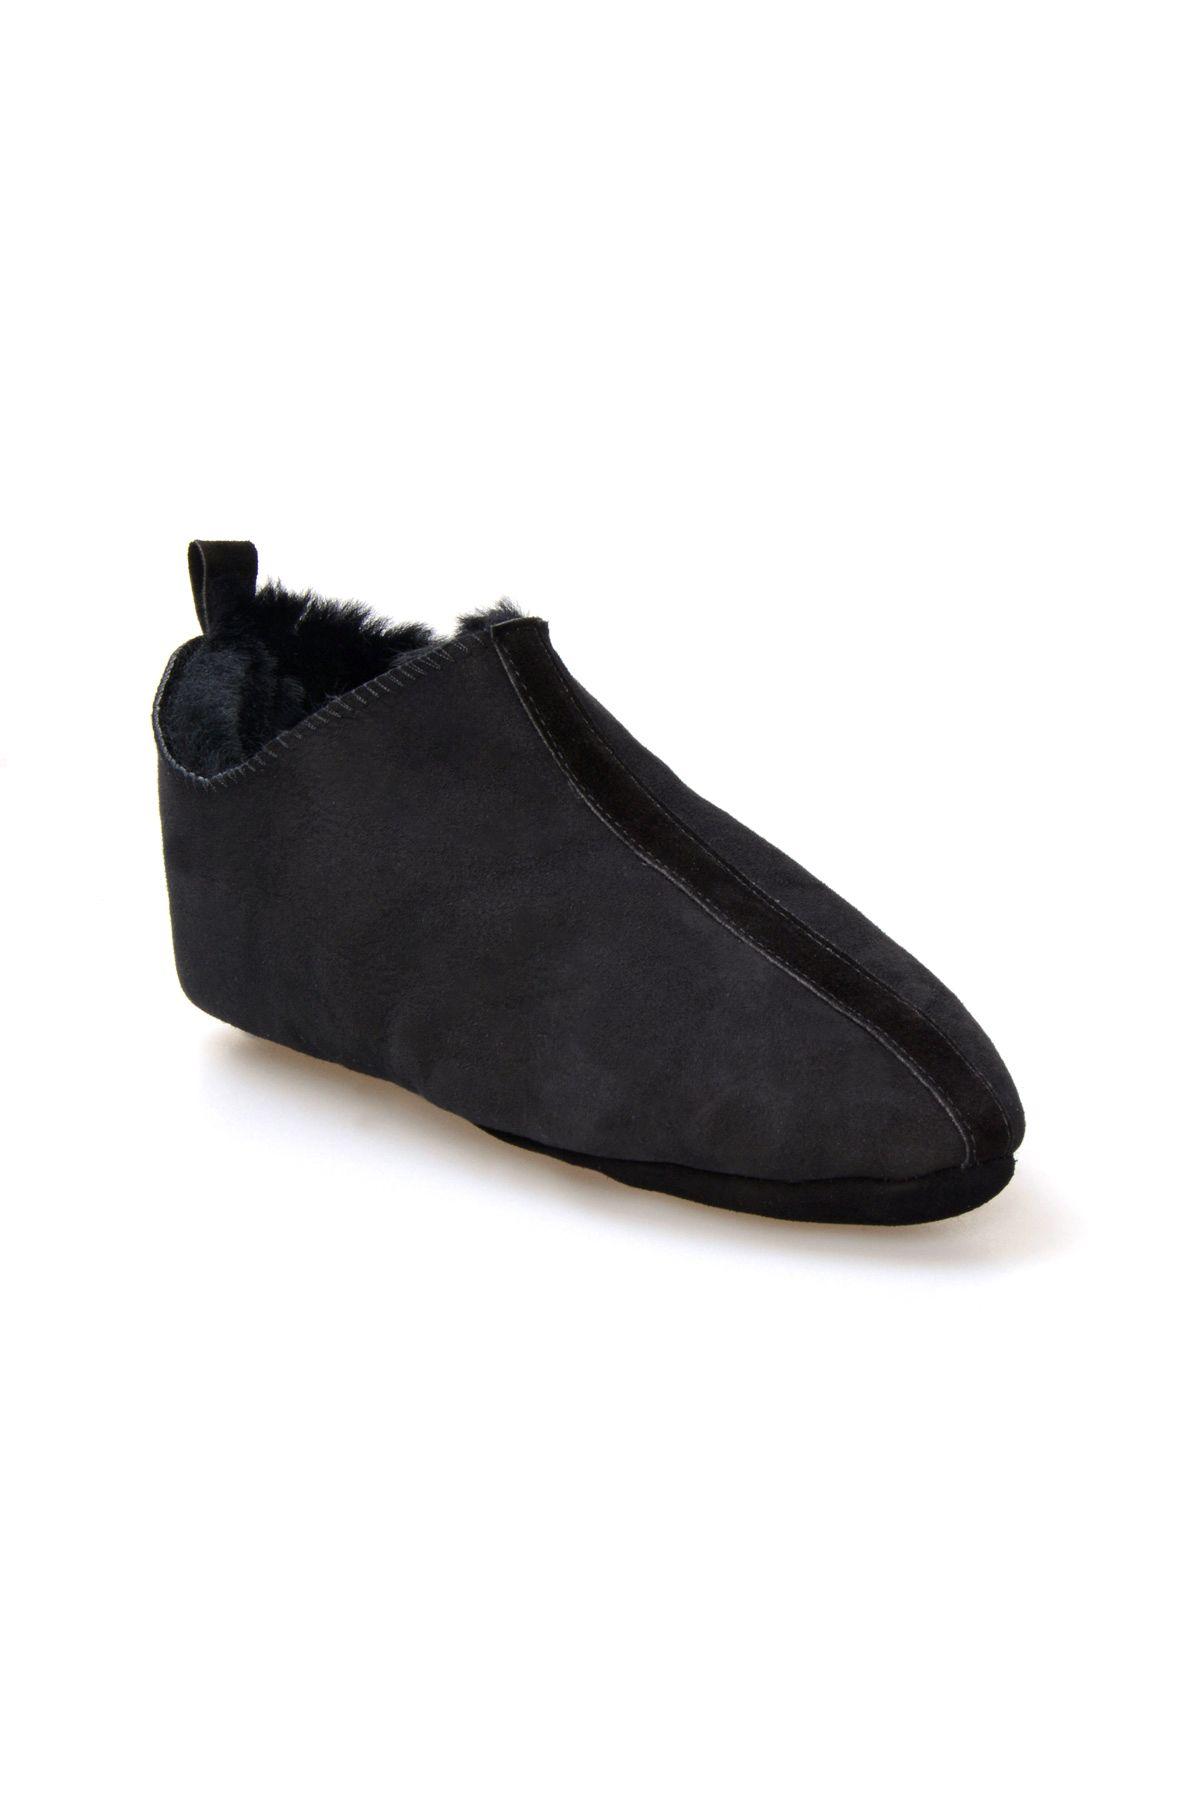 Pegia Men's Home Suede Sheepskin Slippers 111009 Dark Gray